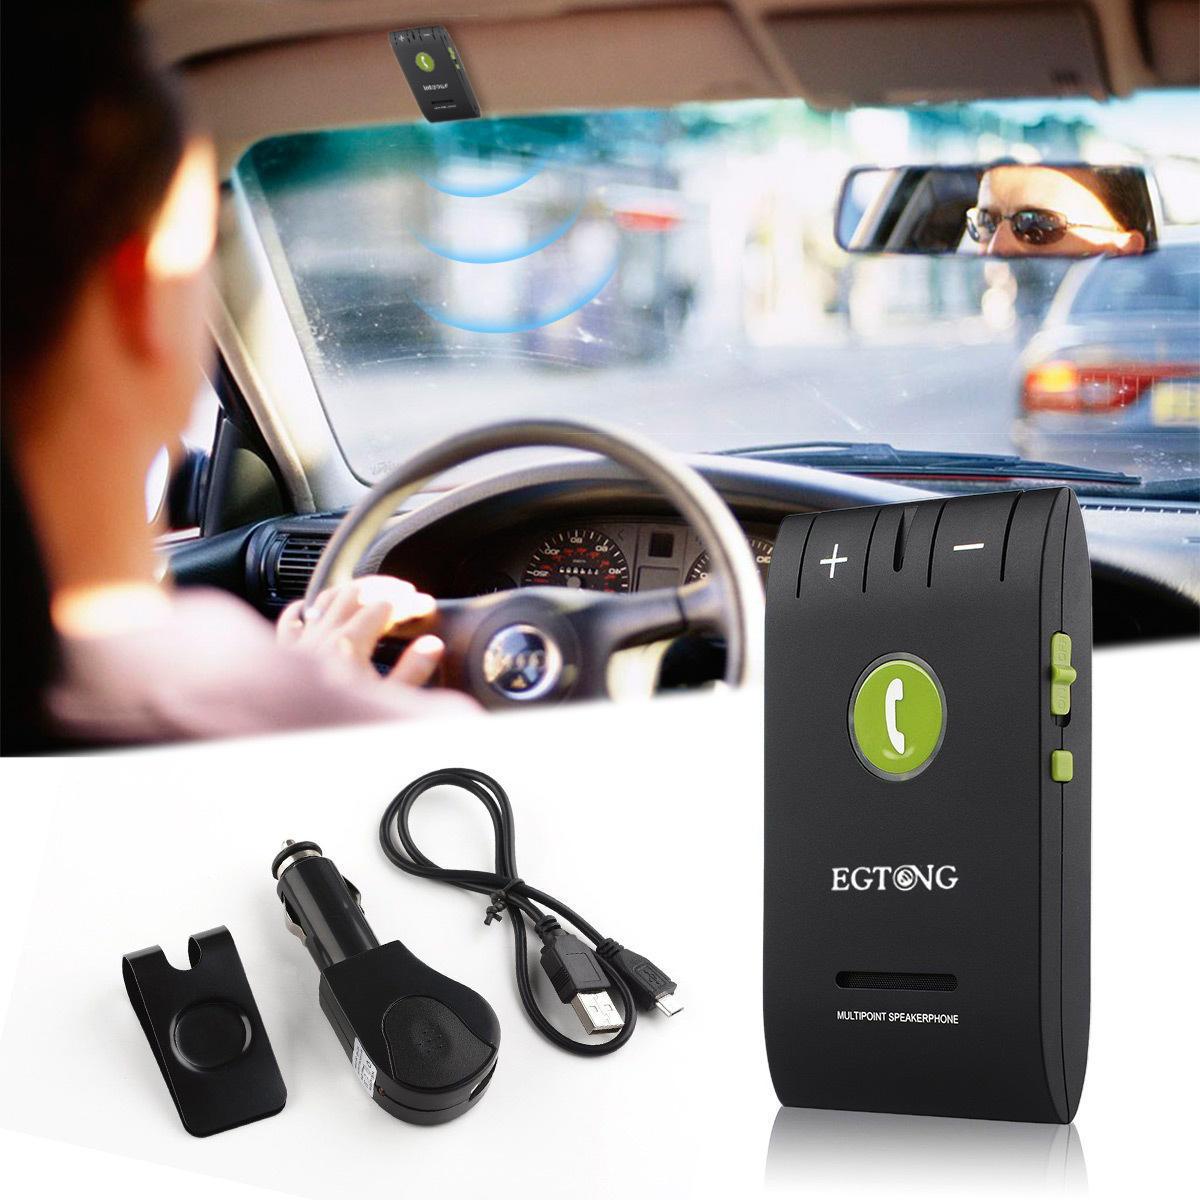 Wireless Bluetooth Hands-free Car Kit / Multipoint Speakerphone Car Kit GZA-00307